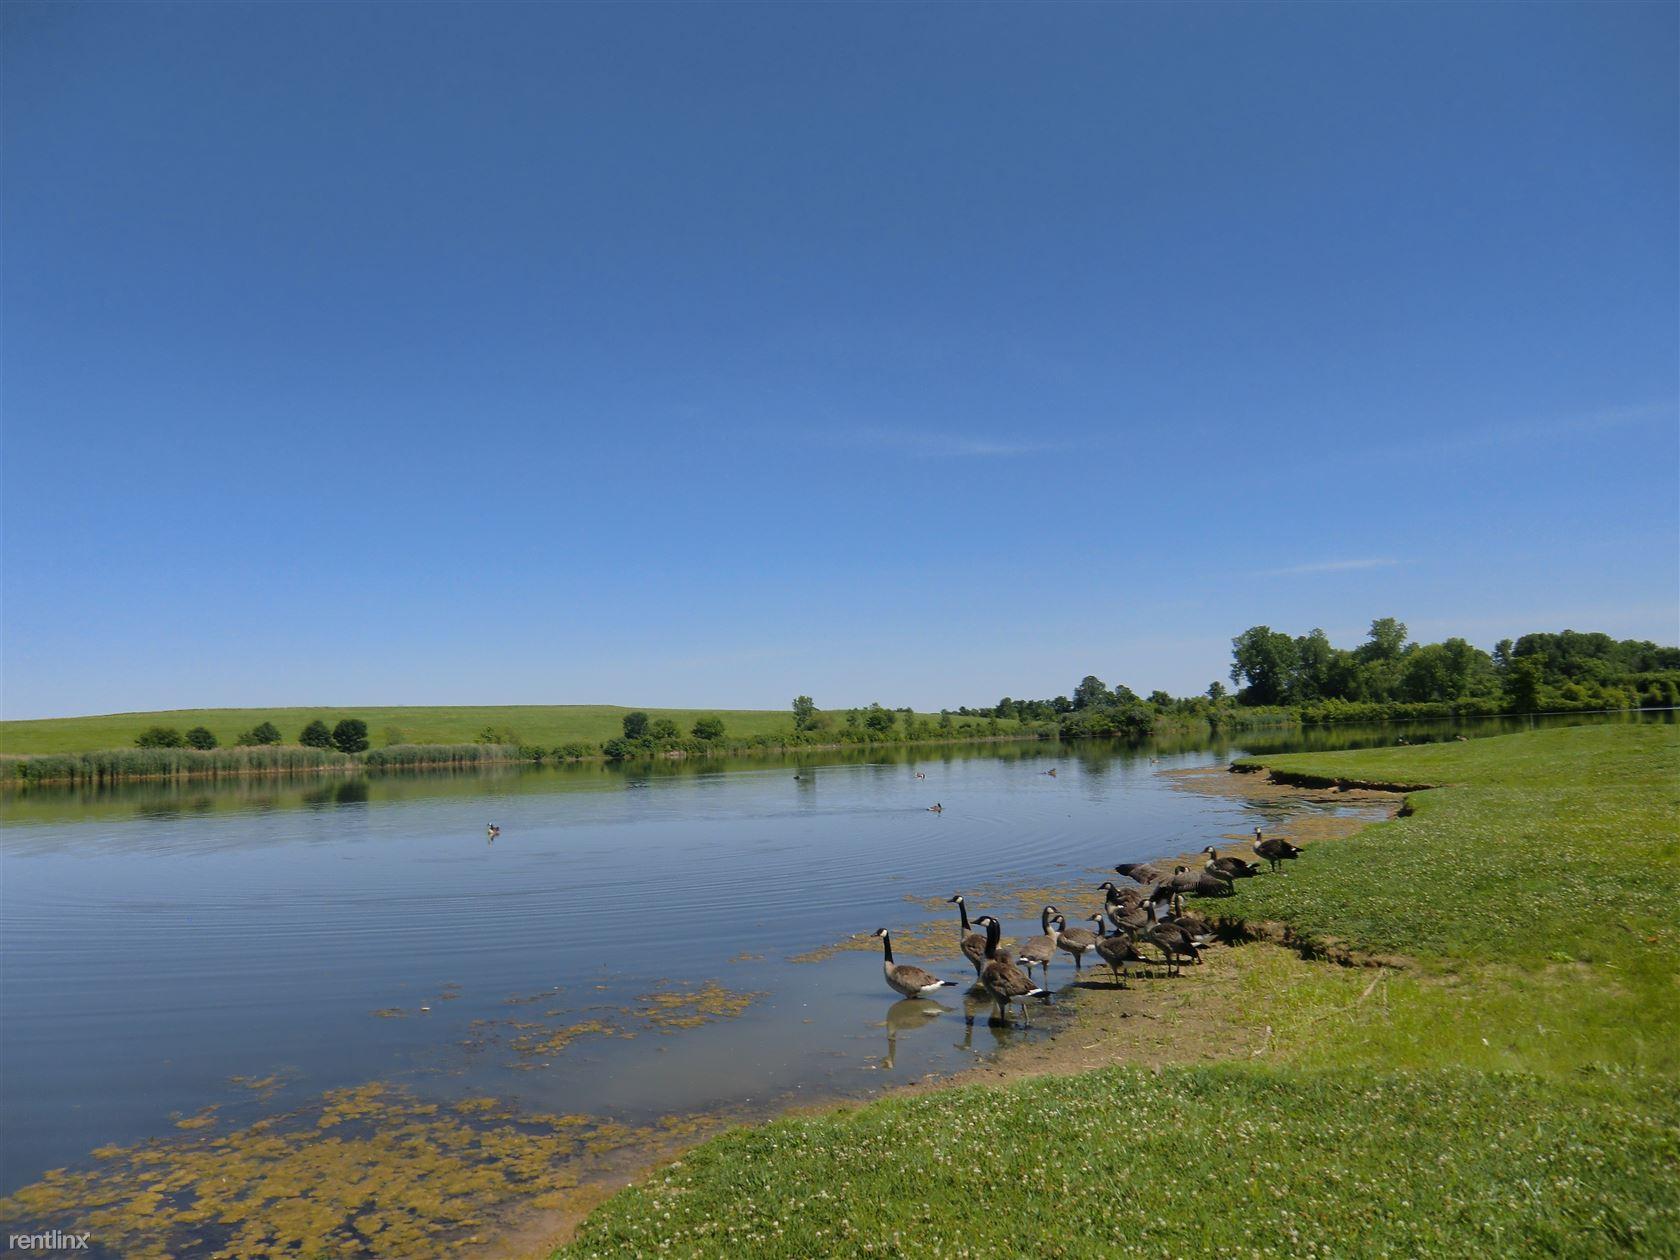 LSE pond